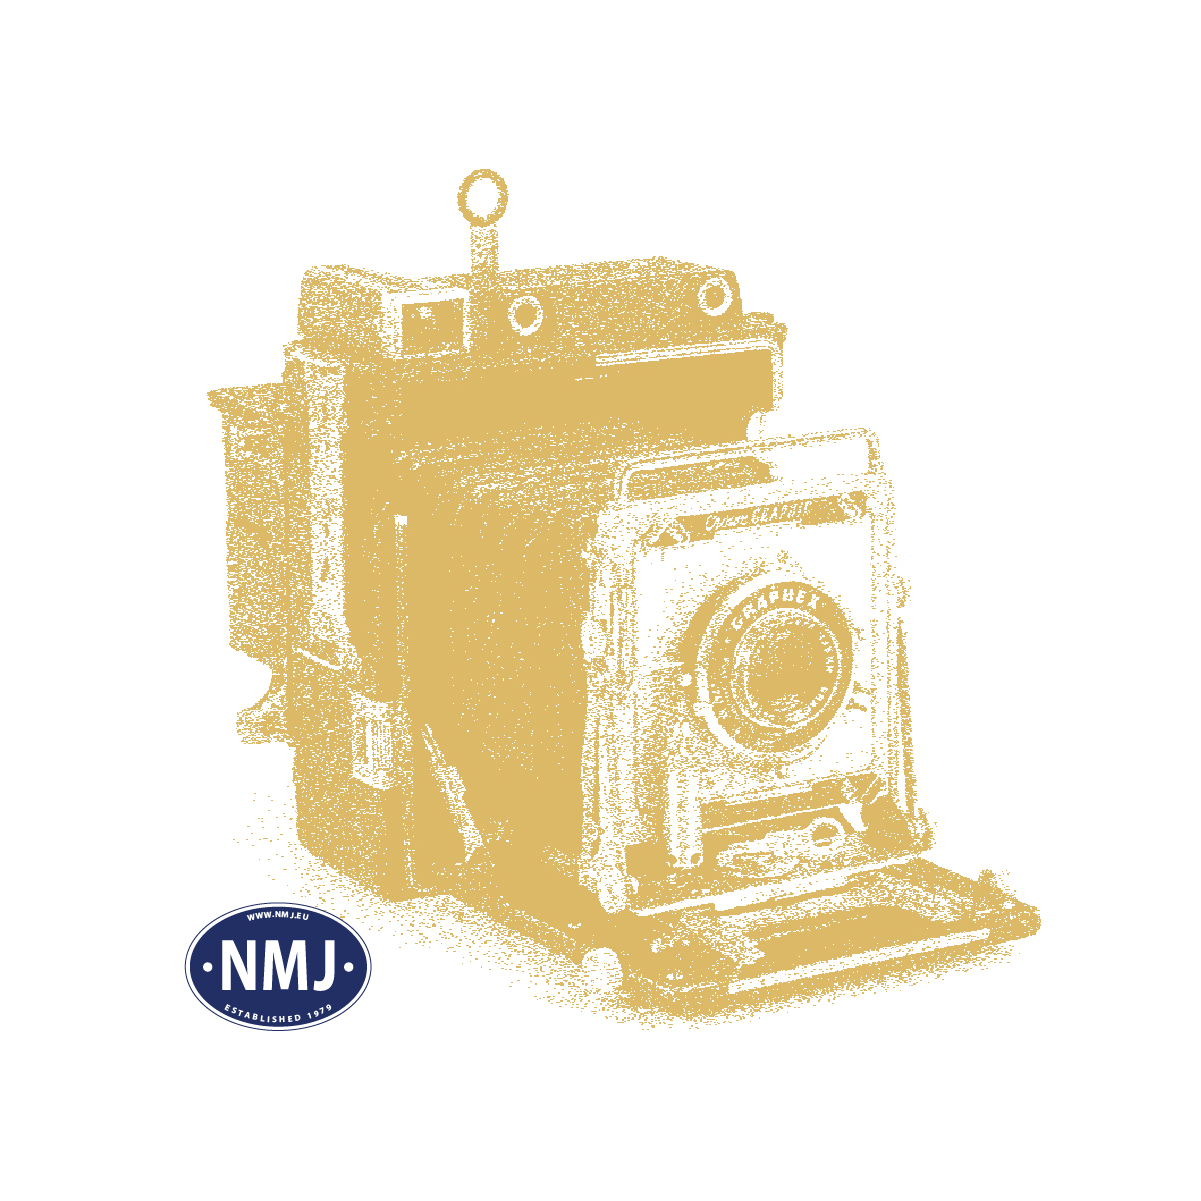 NMJT84.203AC - NMJ Topline NSB BM69A.06, AC Digital